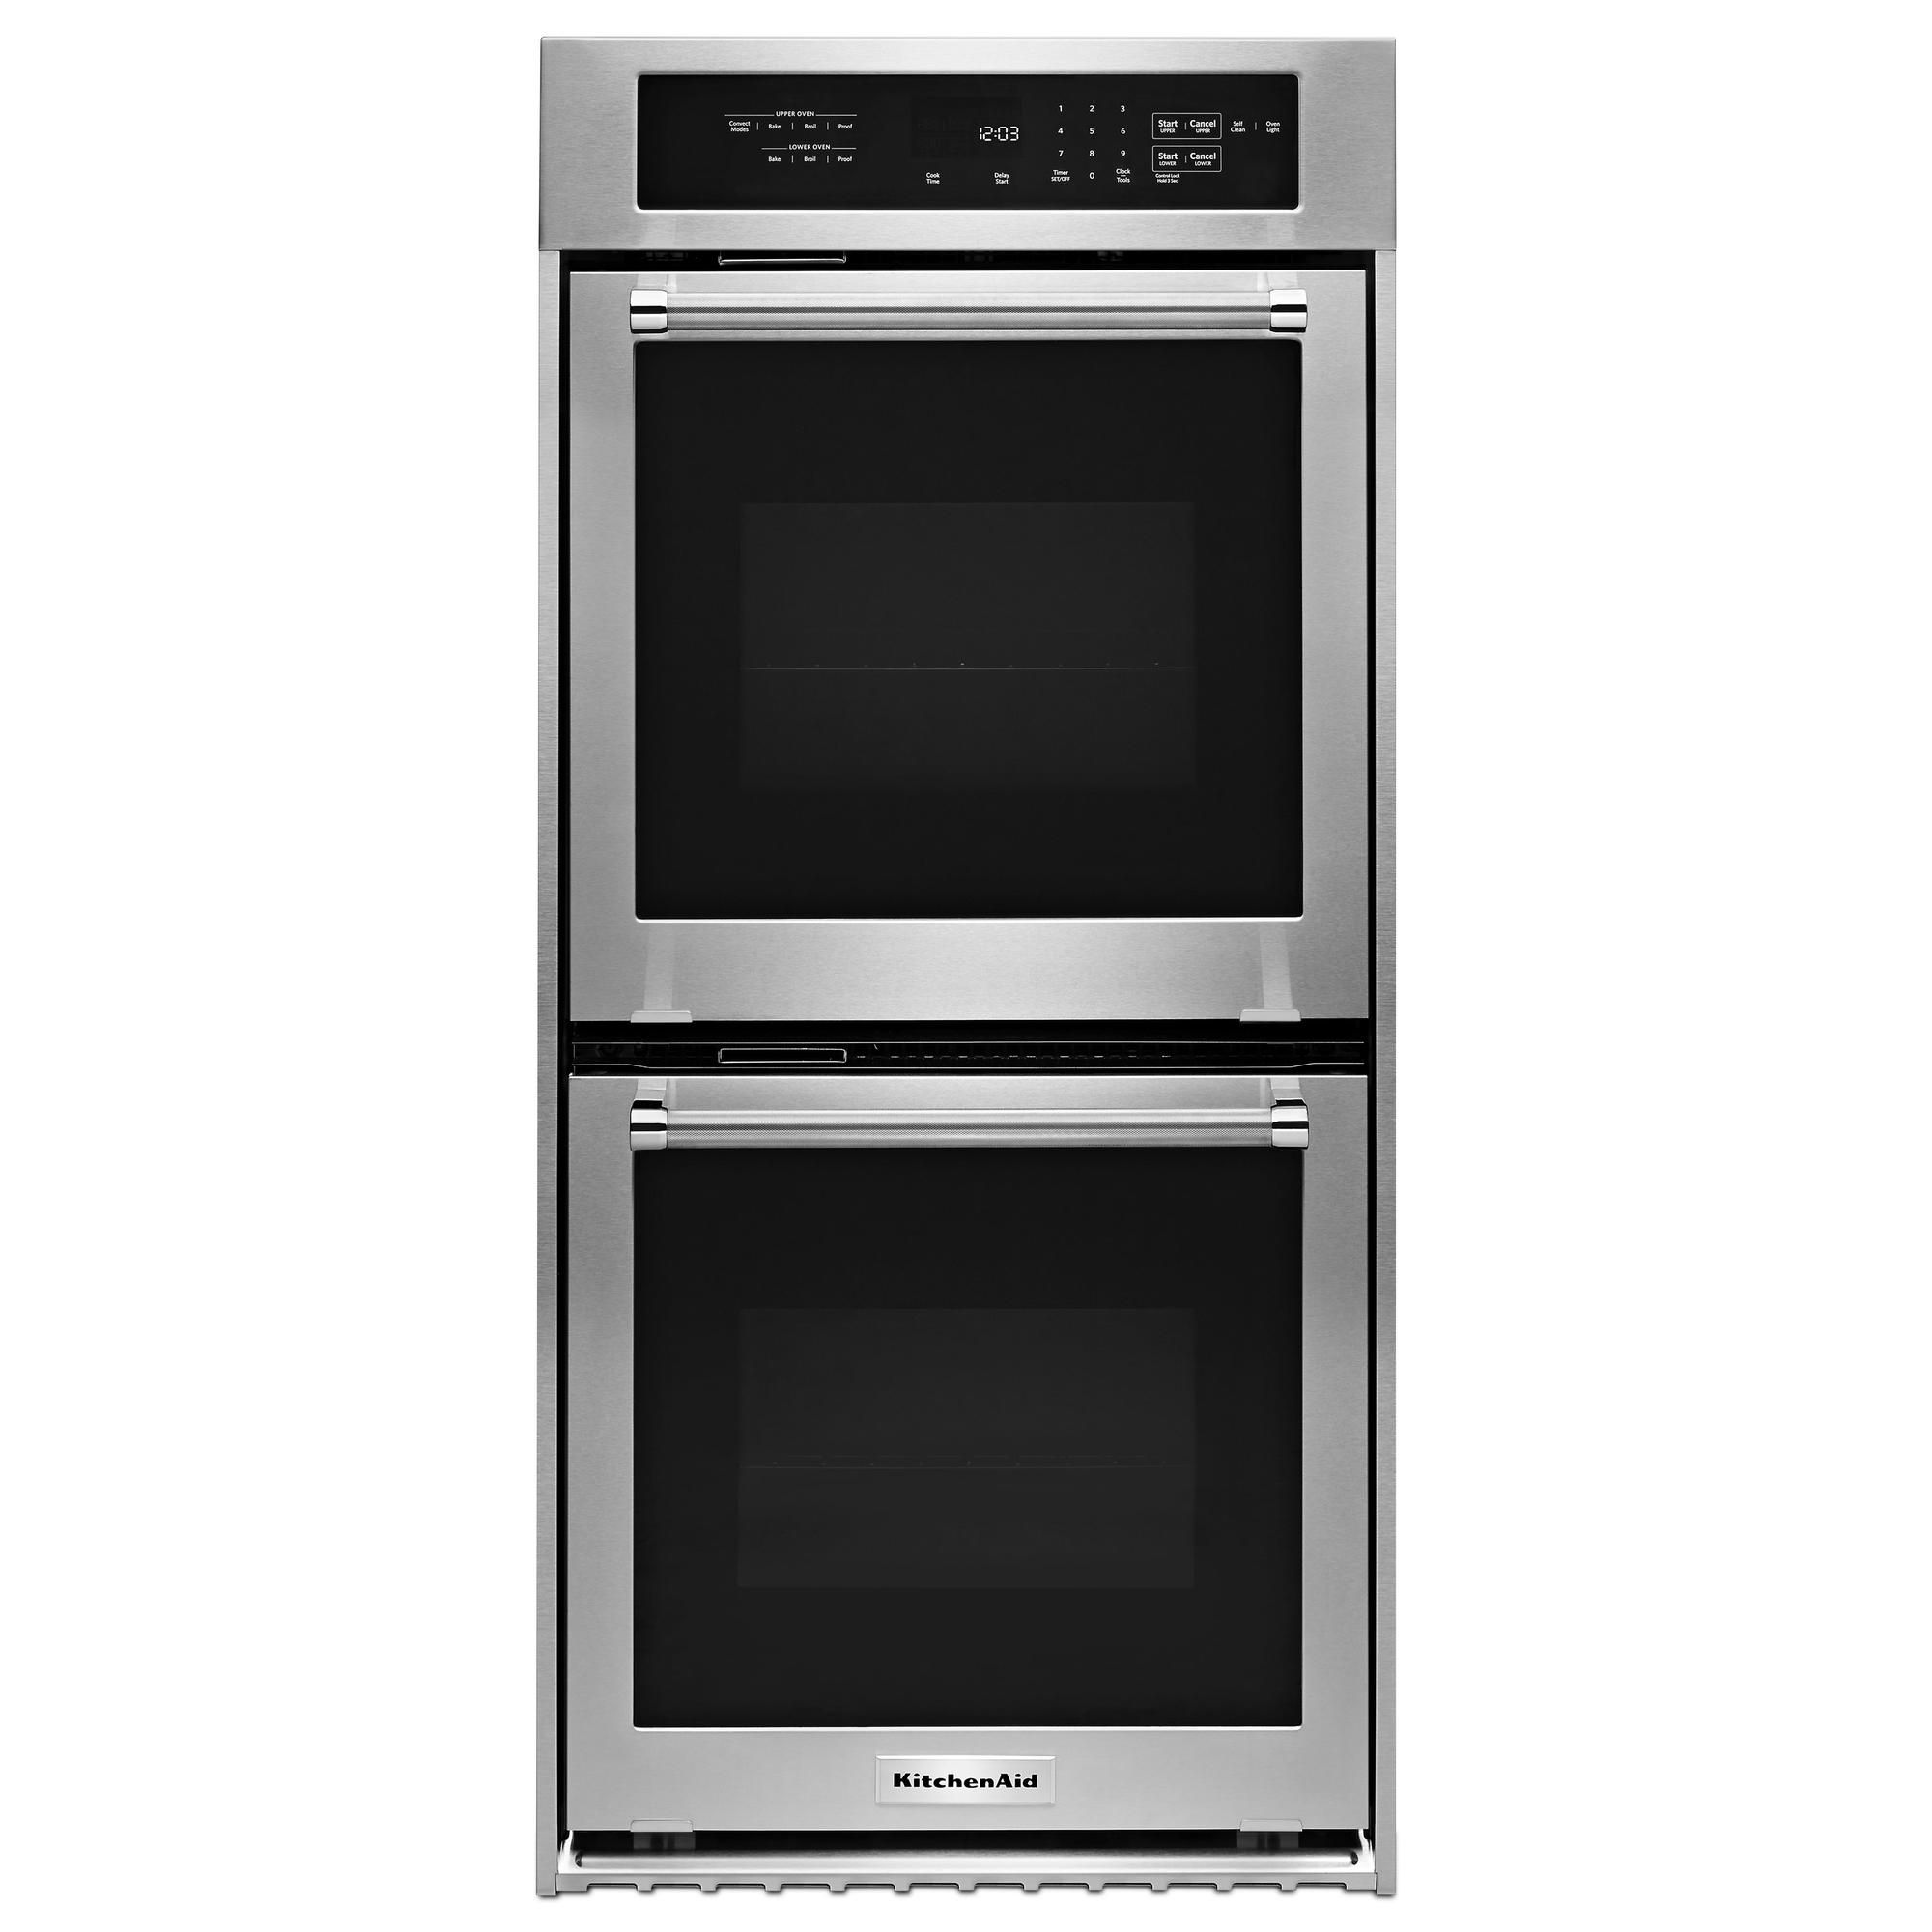 "KitchenAid KODC304ESS 24"" Double Wall Oven w/ True ..."